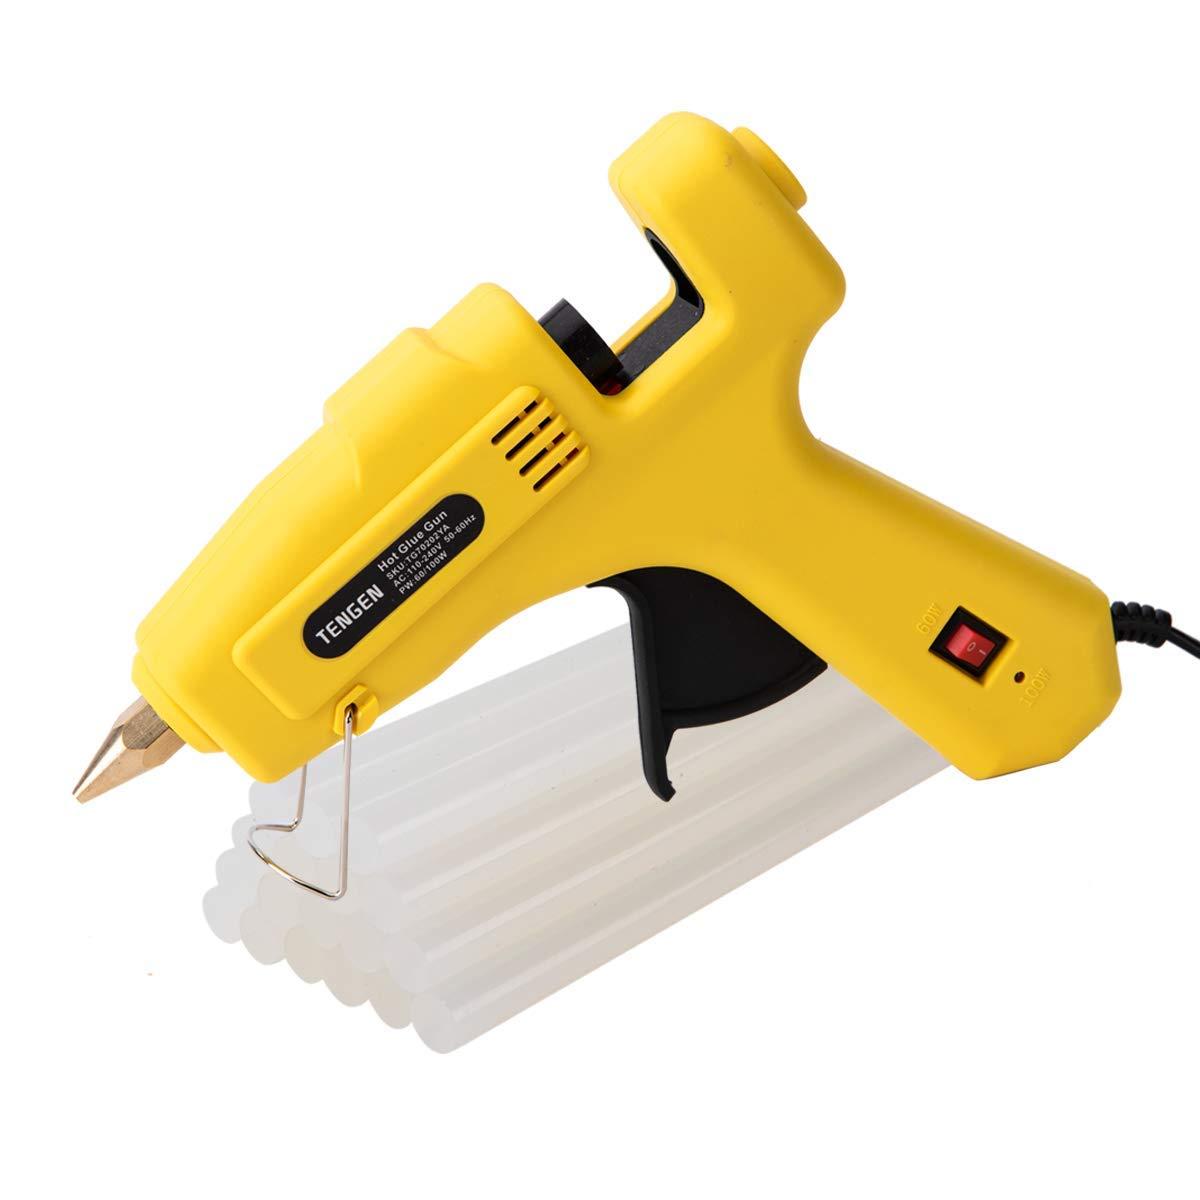 TENGEN Hot Glue Gun with 18 pcs Glue Sticks, High Temp Melting Glue Gun for DIY, Arts & Crafts Use